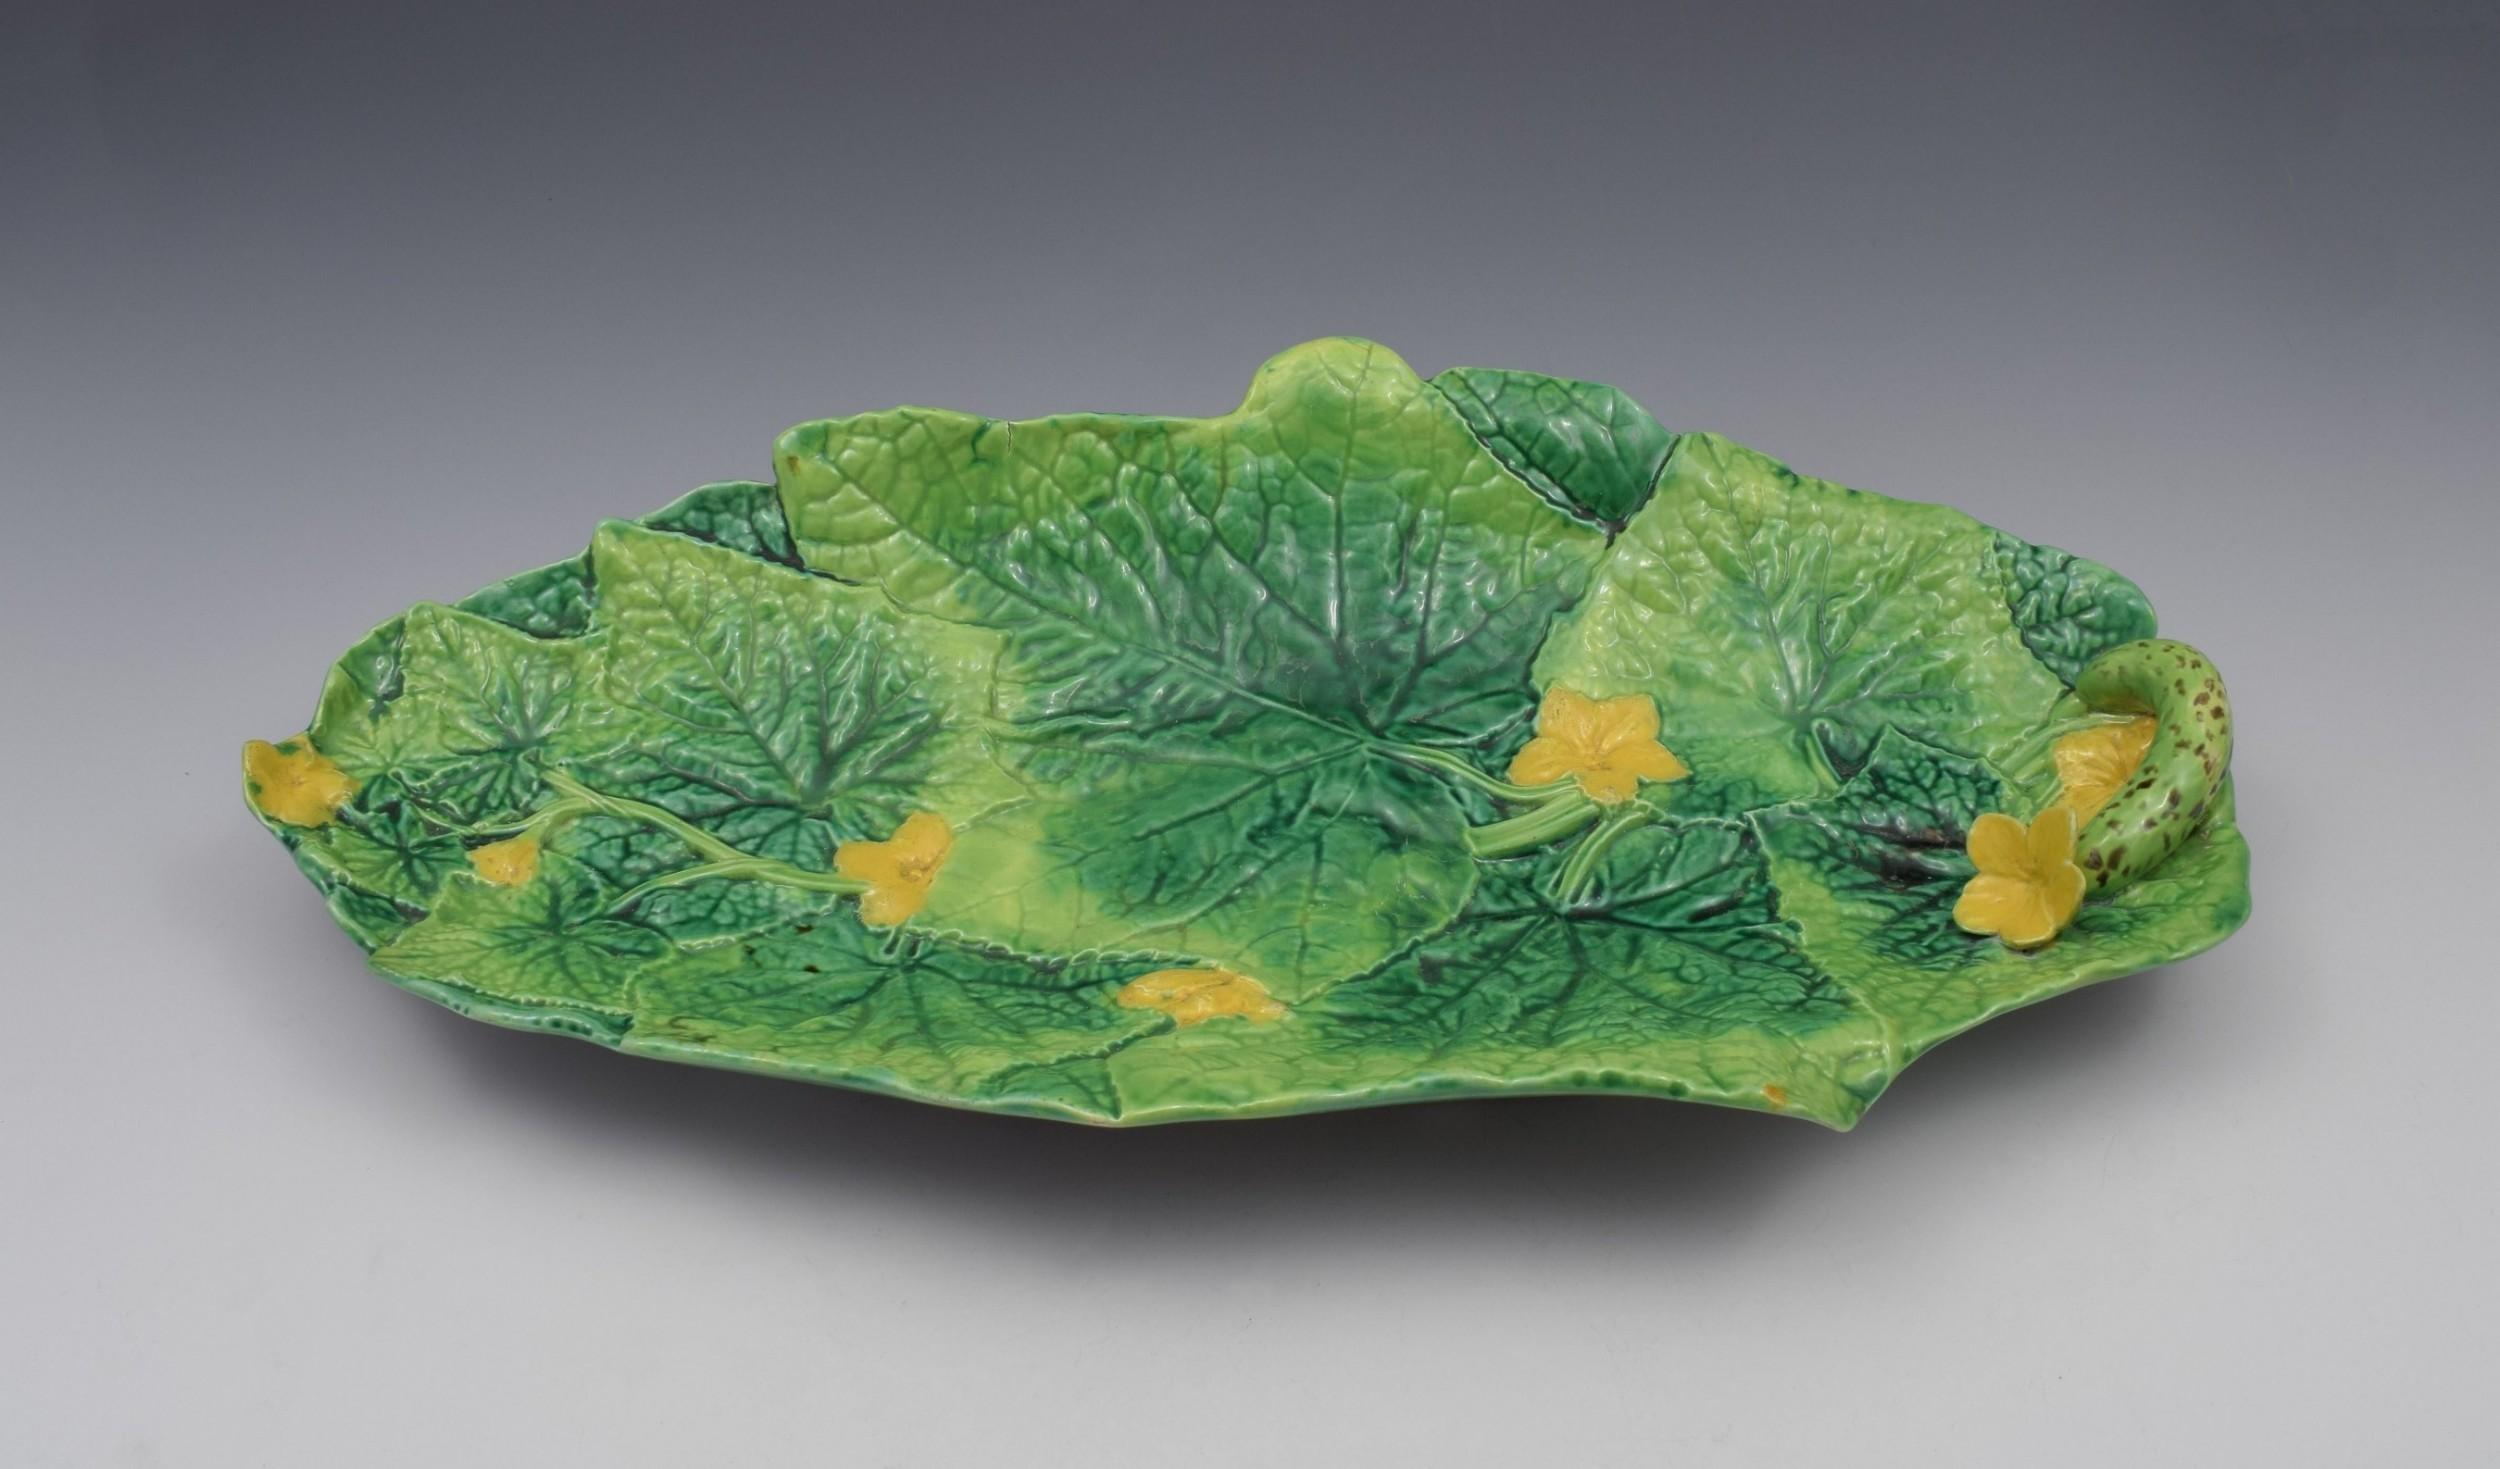 victorian george jones majolica cucumber serving tray dish model 2563